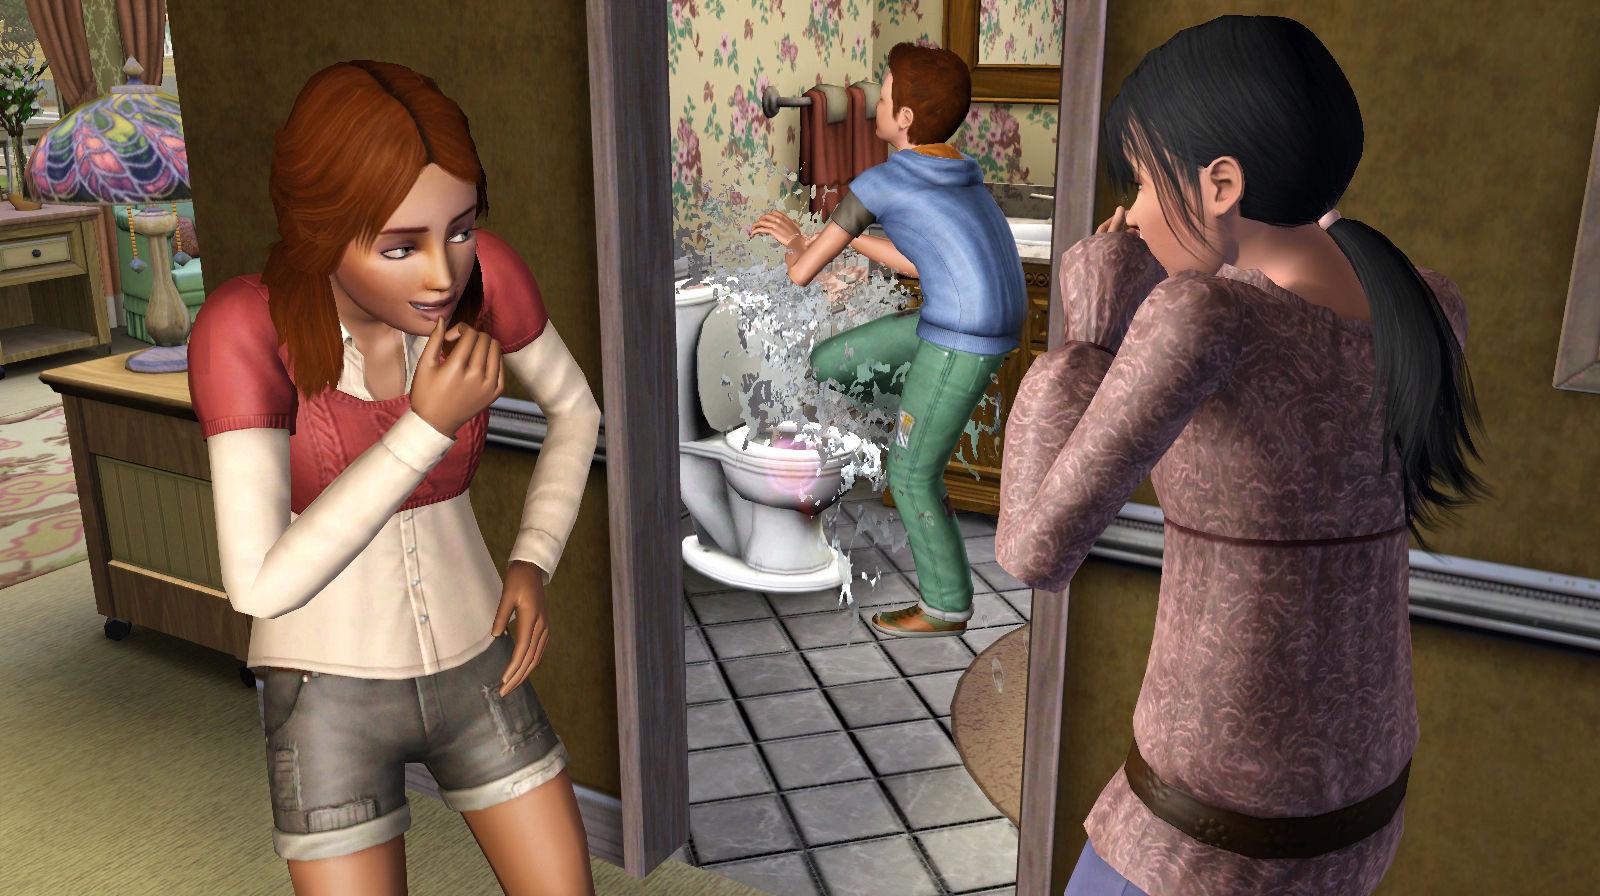 Osta The Sims 3: Generations PC Peli Origin Download